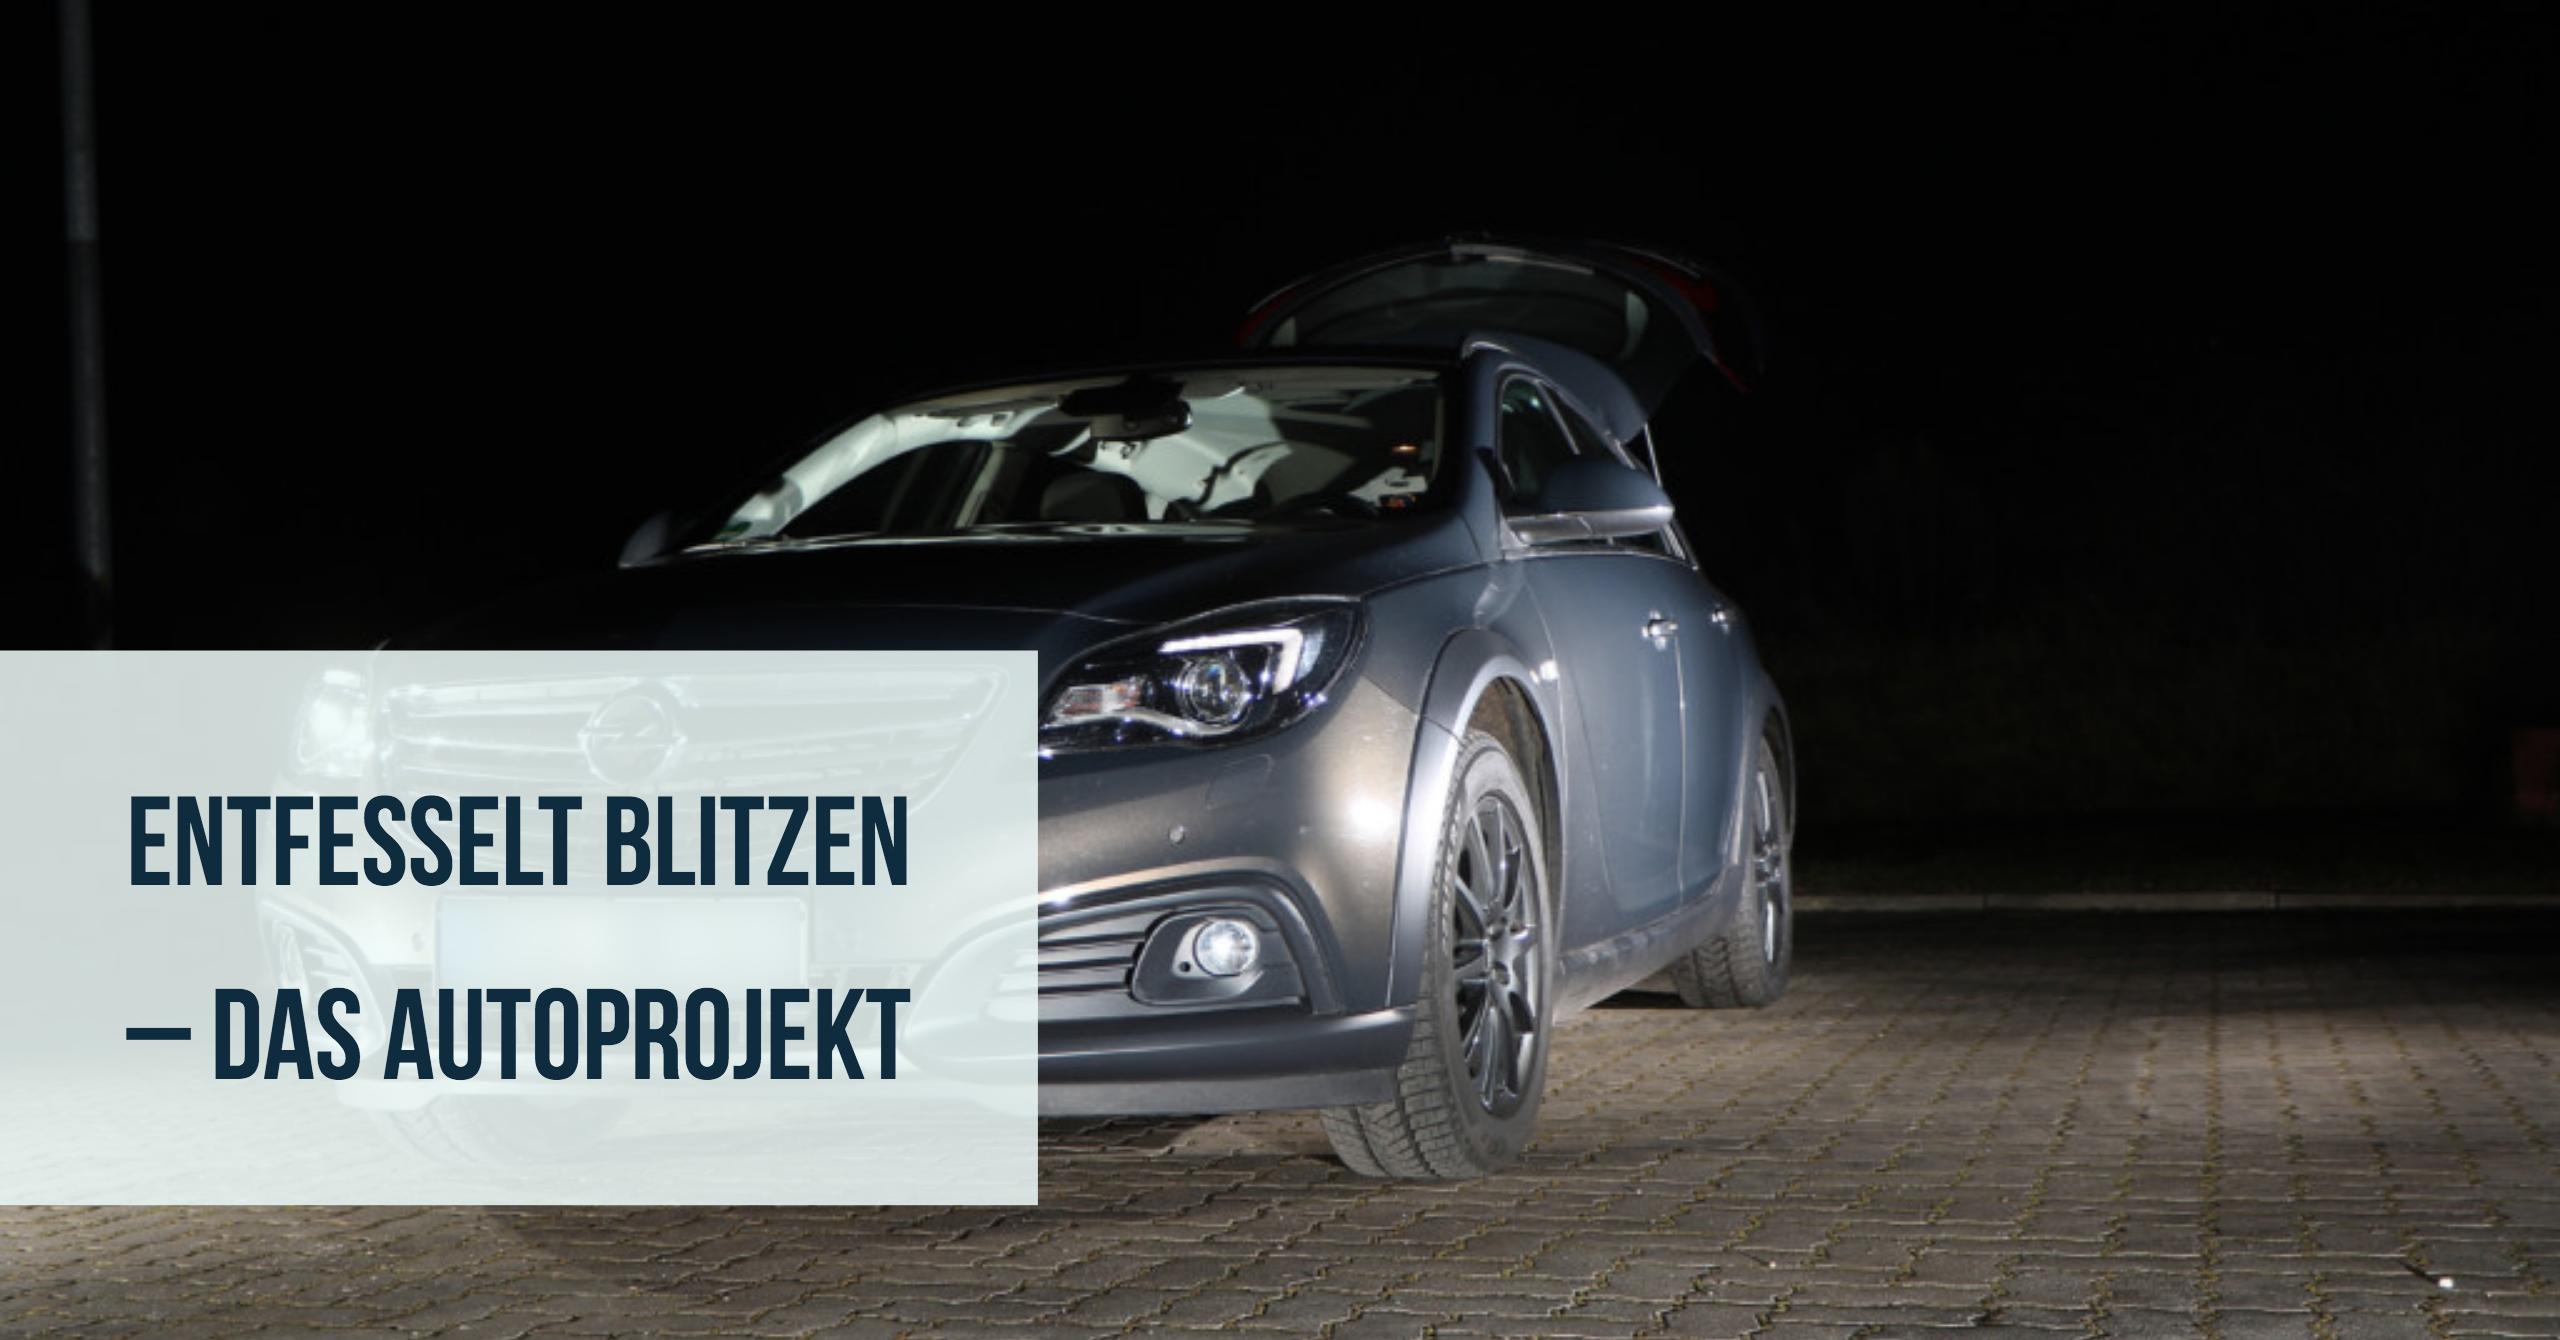 entfesselt-blitzen-das-autoprojekt-teaser